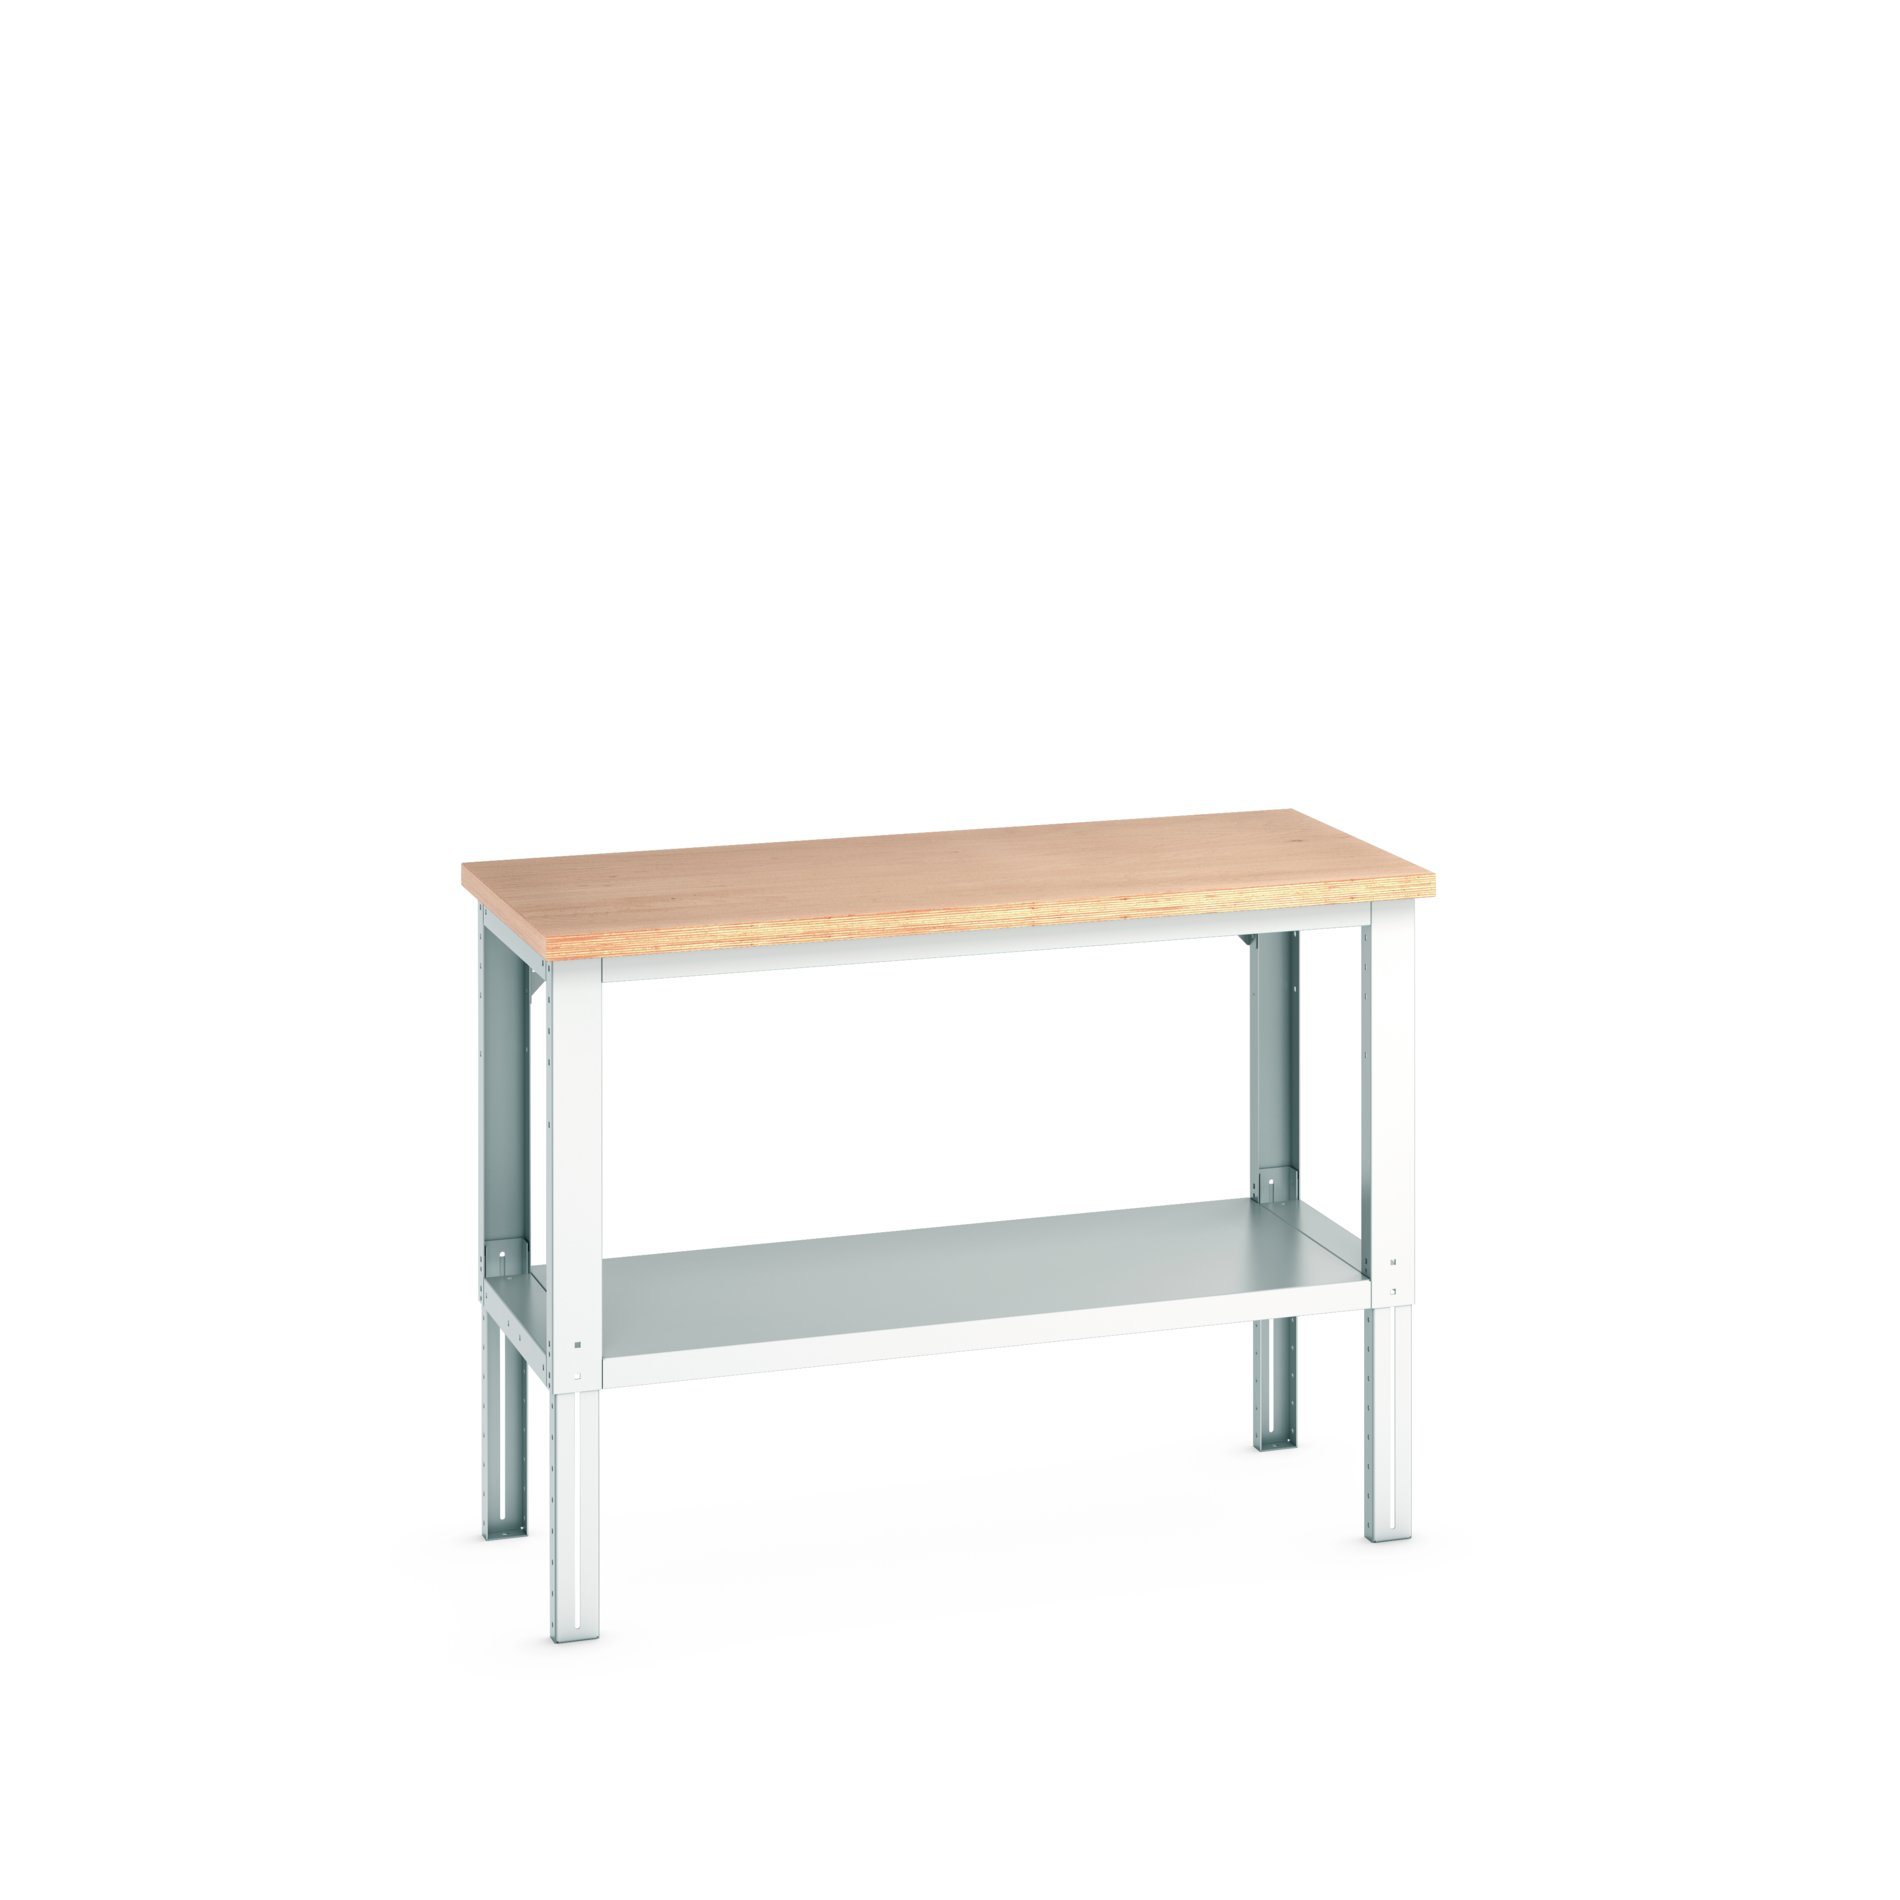 Bott Cubio Adjustable Height Framework Bench With Full Depth Base Shelf